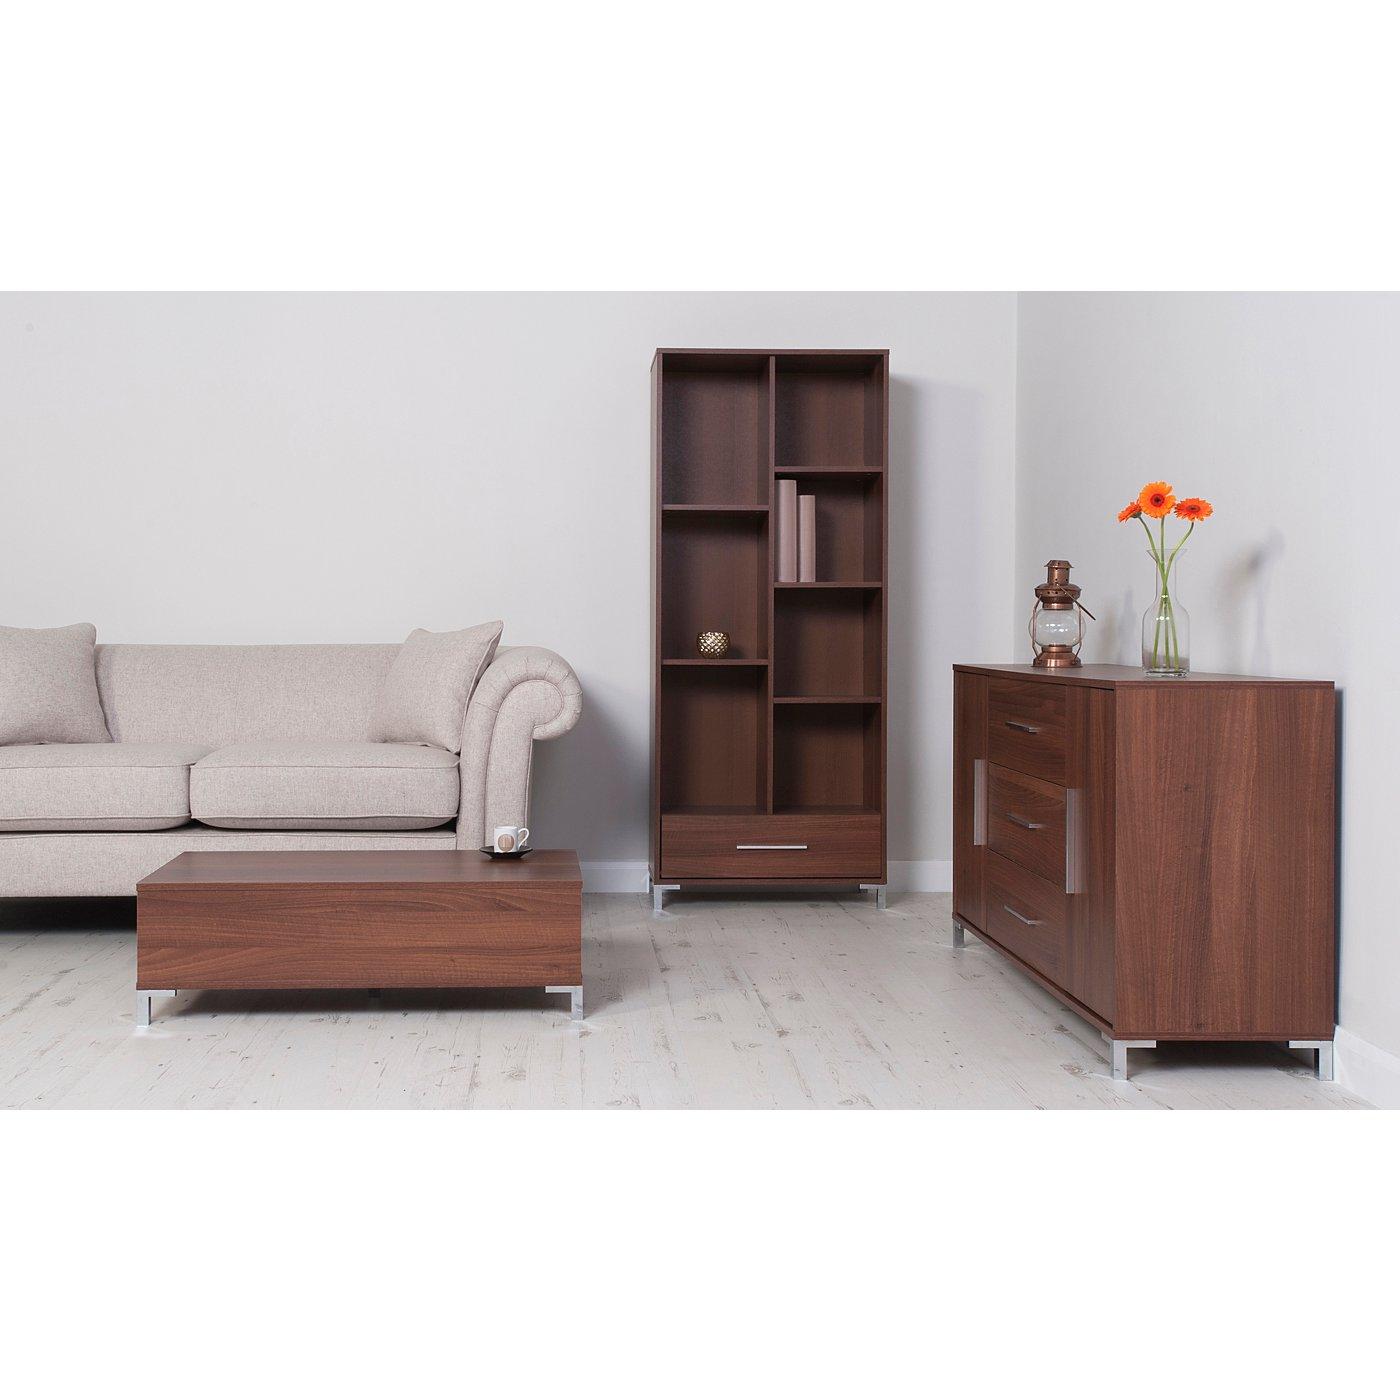 Kaitlin Living Room Furniture Range - Walnut Effect | View All ...